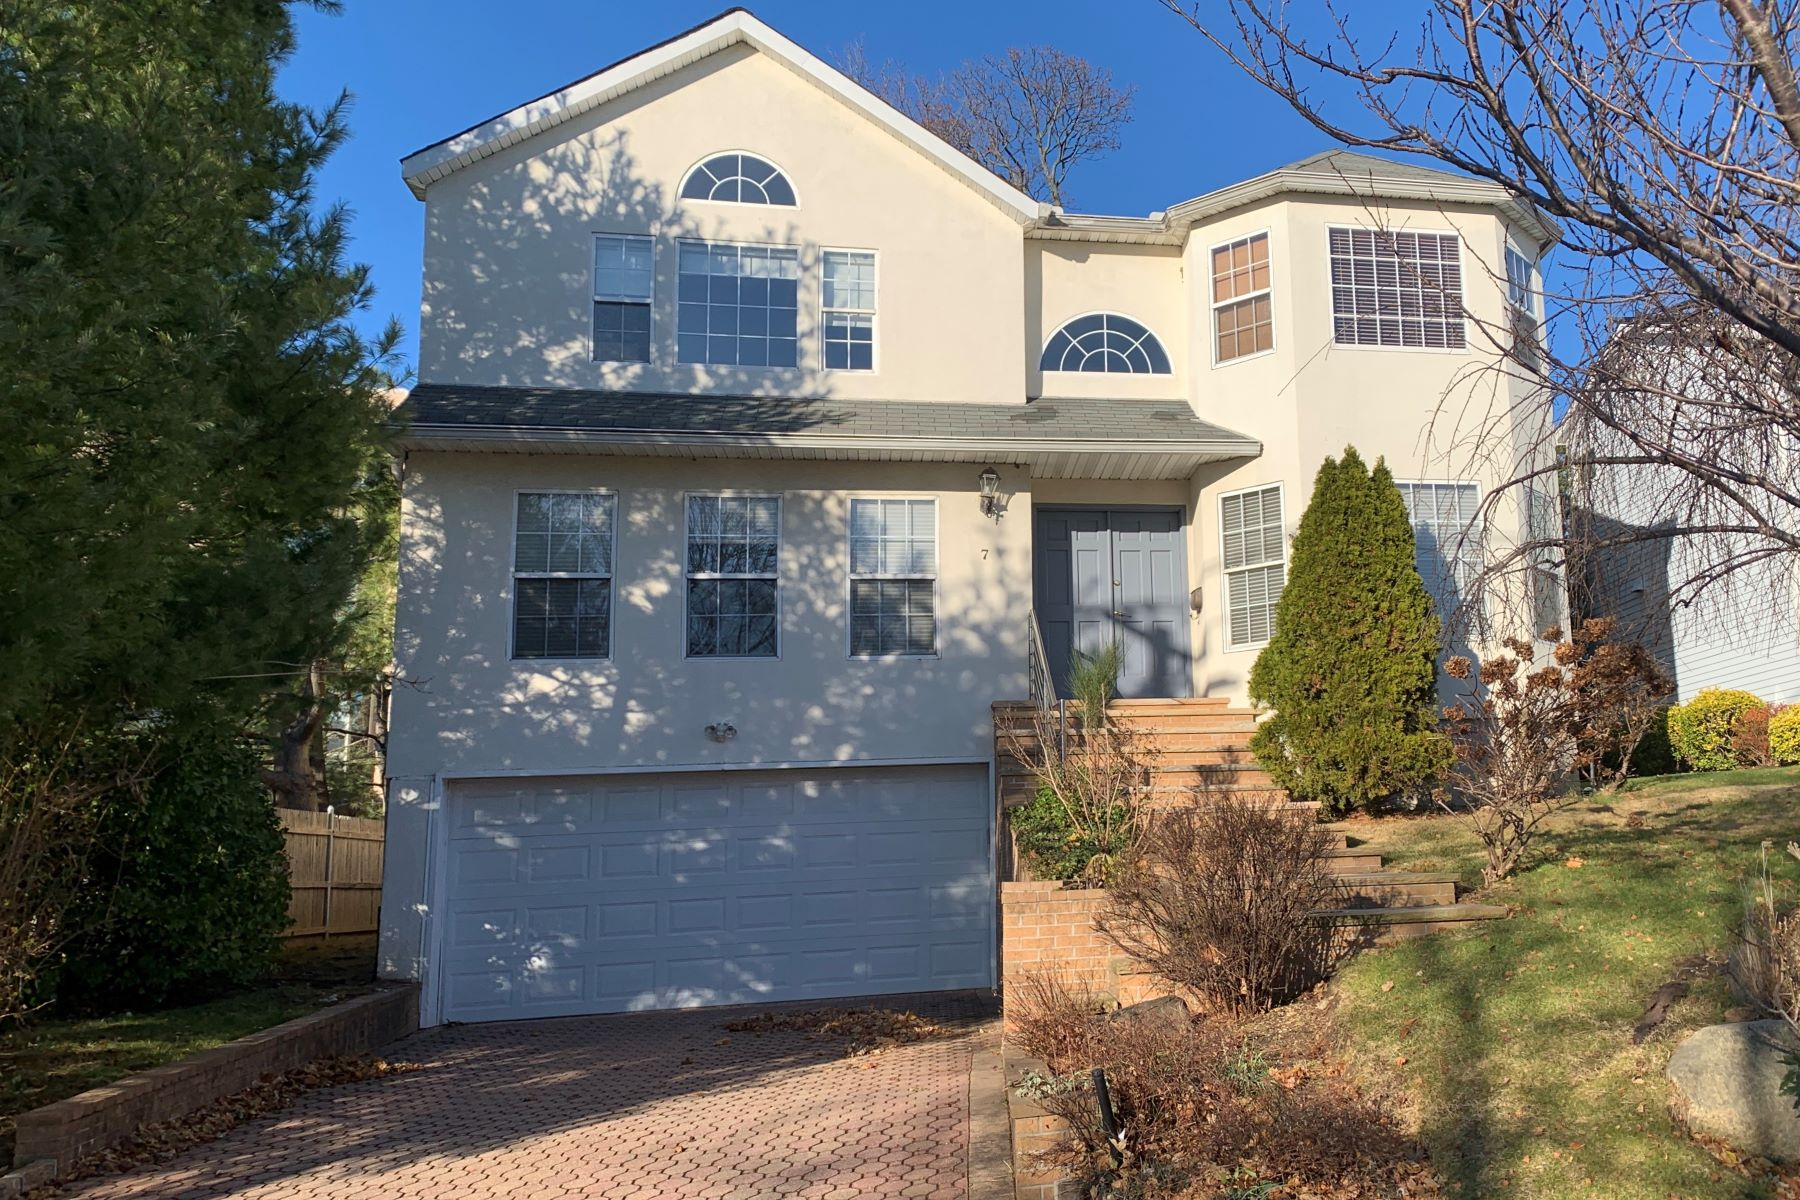 Single Family Homes for Active at Port Washington 7 Prospect Avenue Port Washington, New York 11050 United States